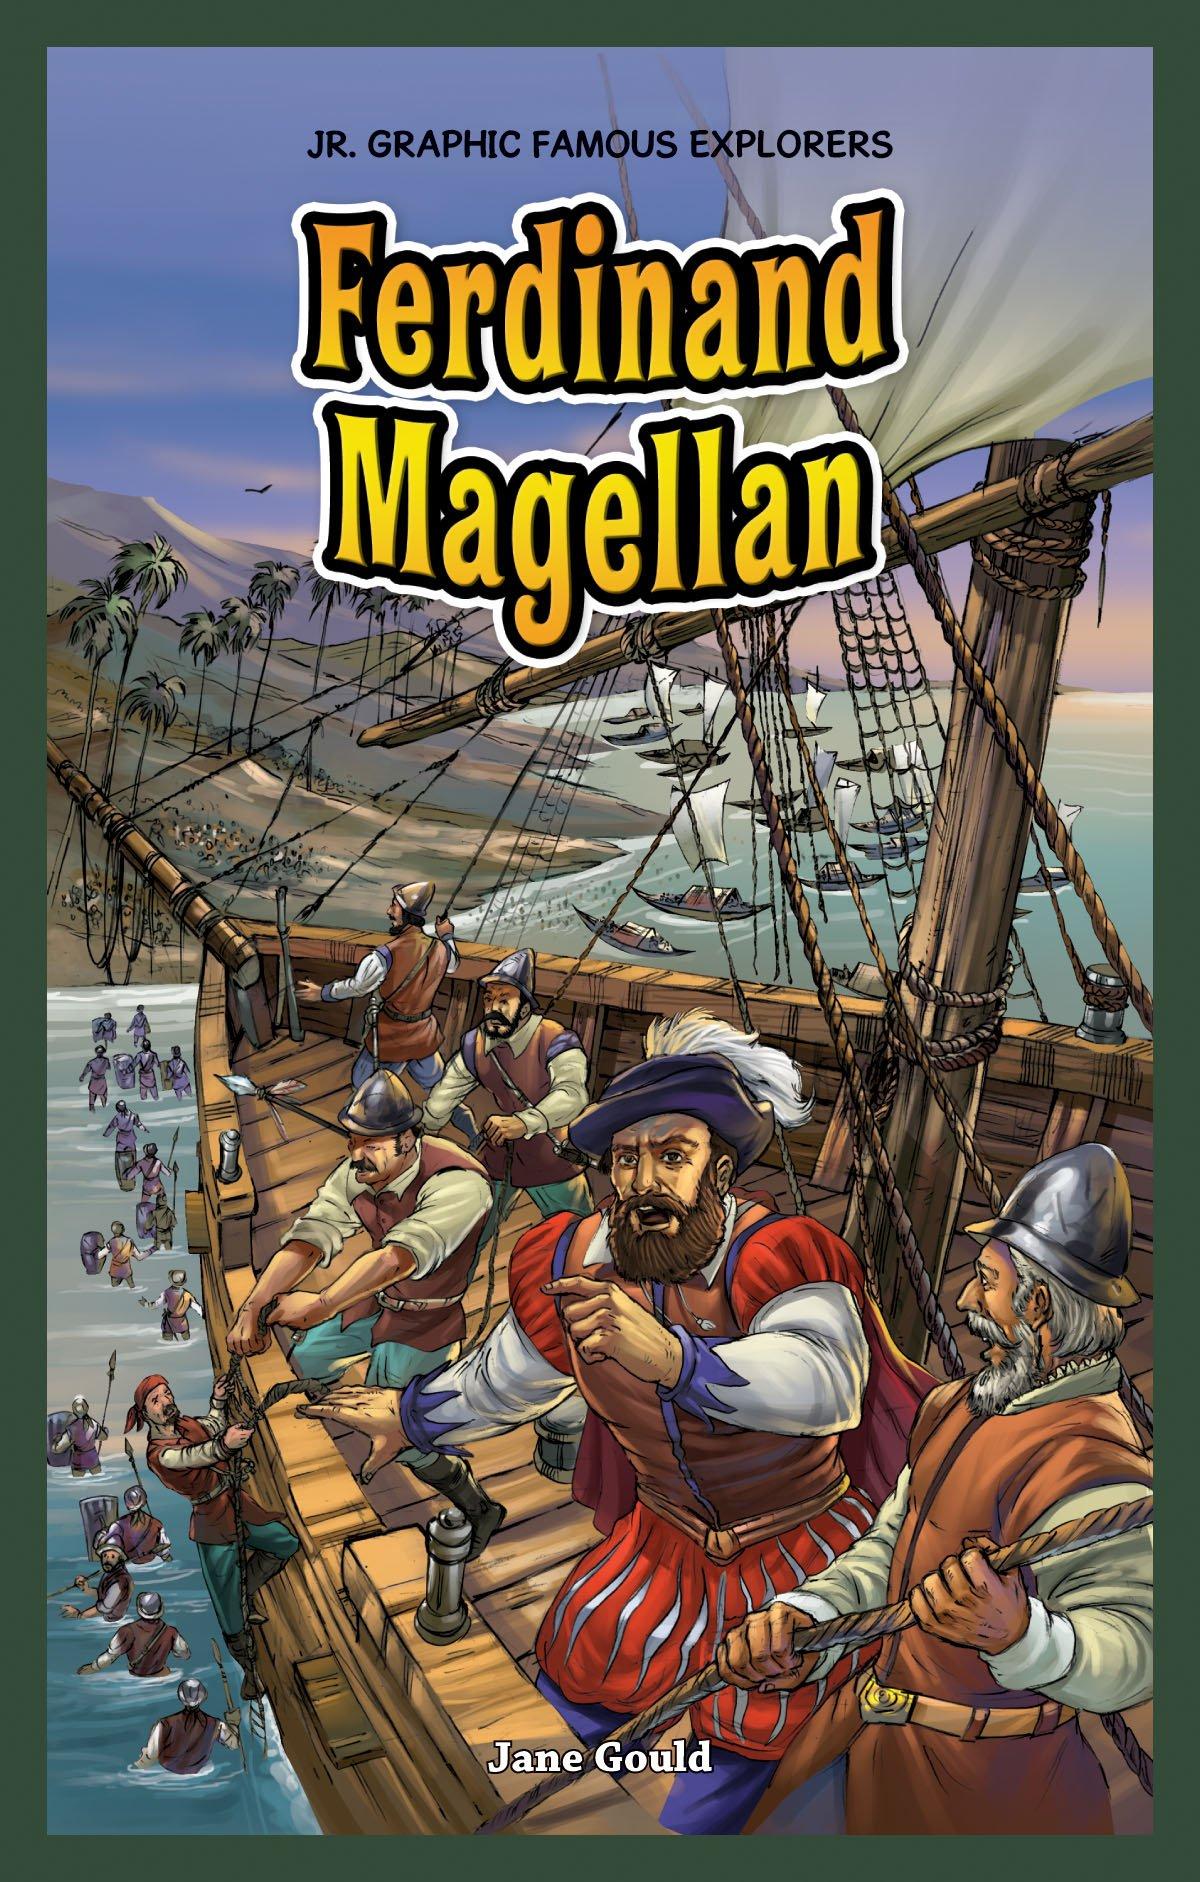 Download Ferdinand Magellan (Jr. Graphic Famous Explorers) ebook